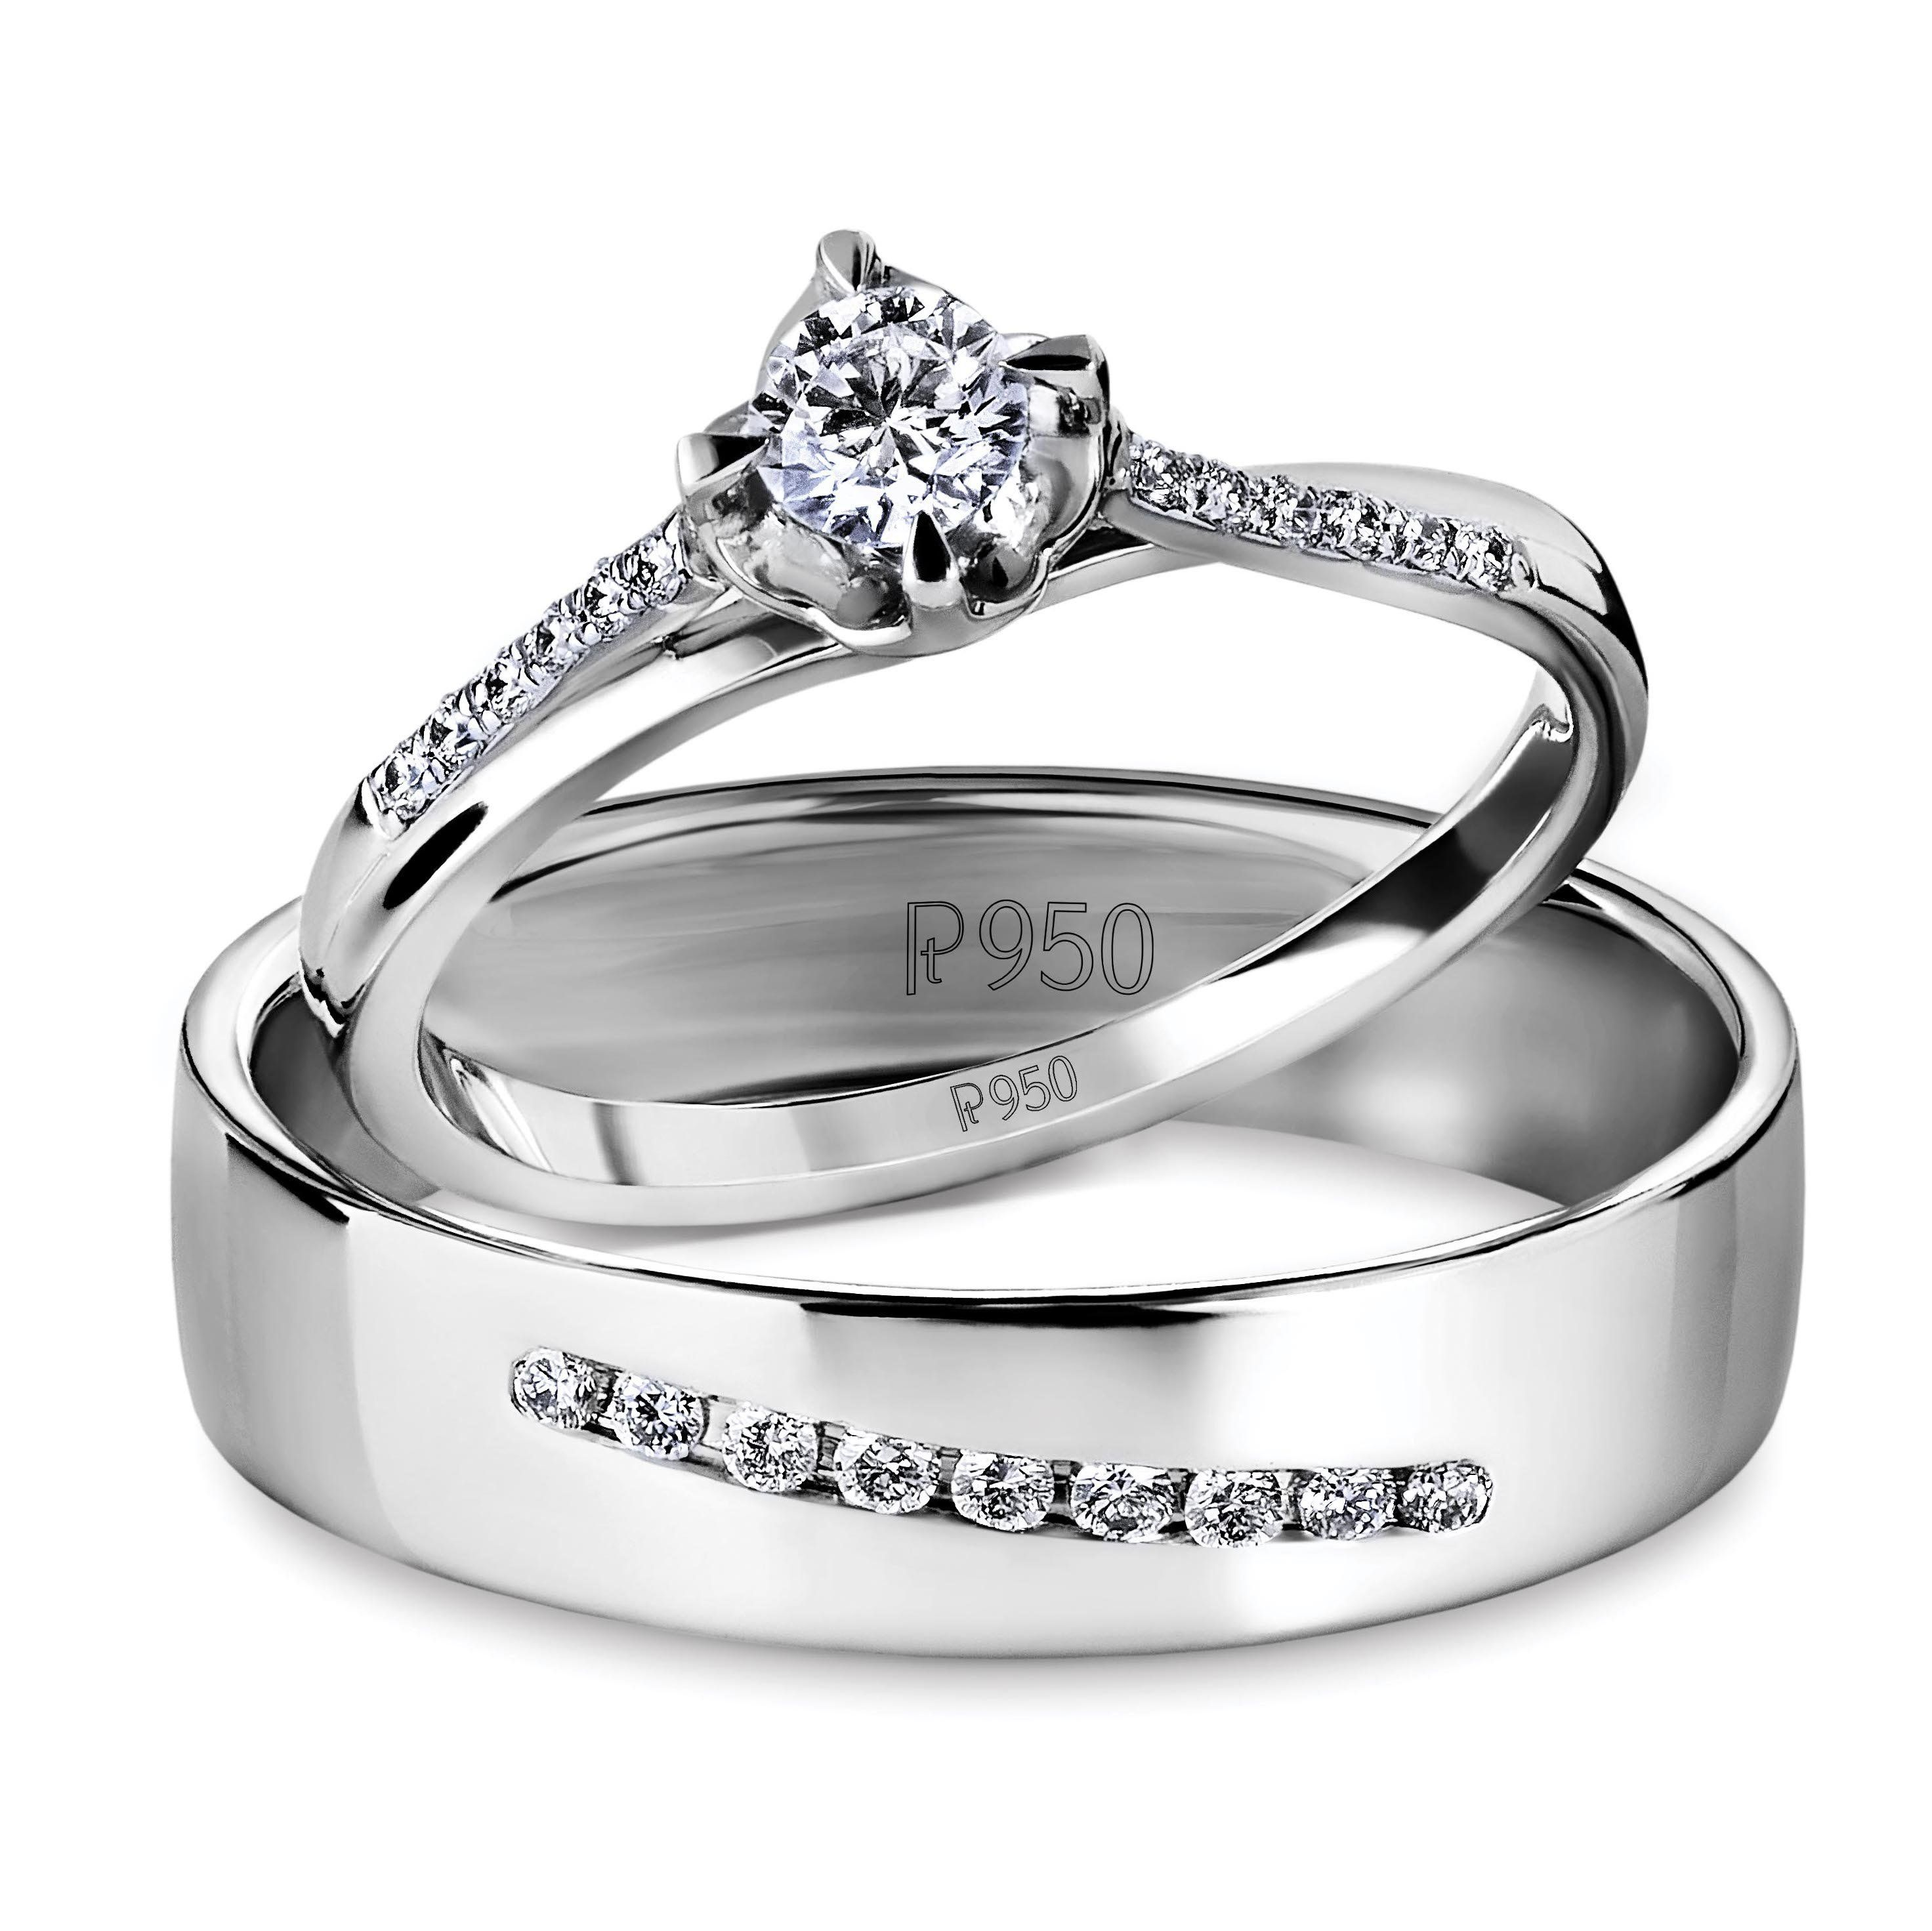 Designer Platinum Love Bands With Diamonds Jl Pt 597 Diamond Wedding Rings Sets Wedding Rings Online Engagement Rings Couple